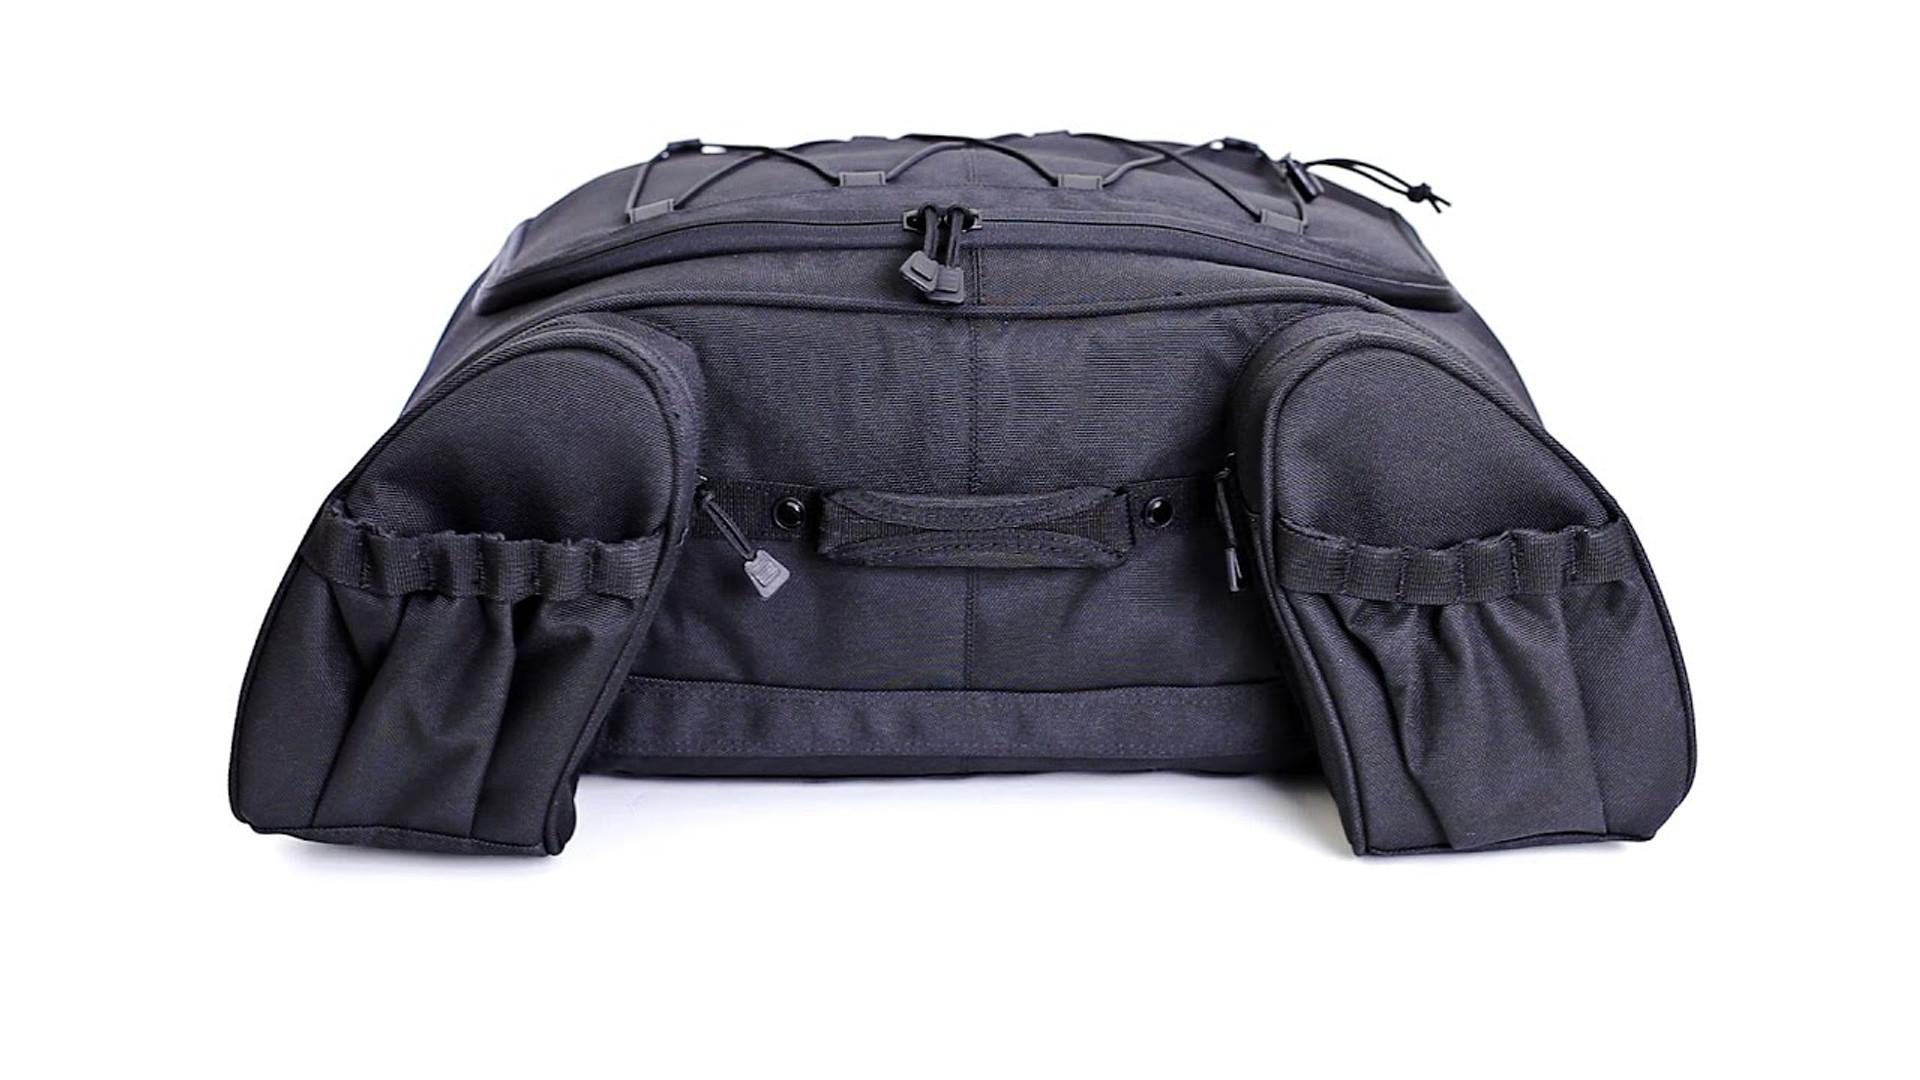 KURYAKYN DELUXE MOMENTUM HITCHHIKER LUGGAGE RACK BAG TOURING HARLEY FLH FLHX STARNSANDSONS.COM